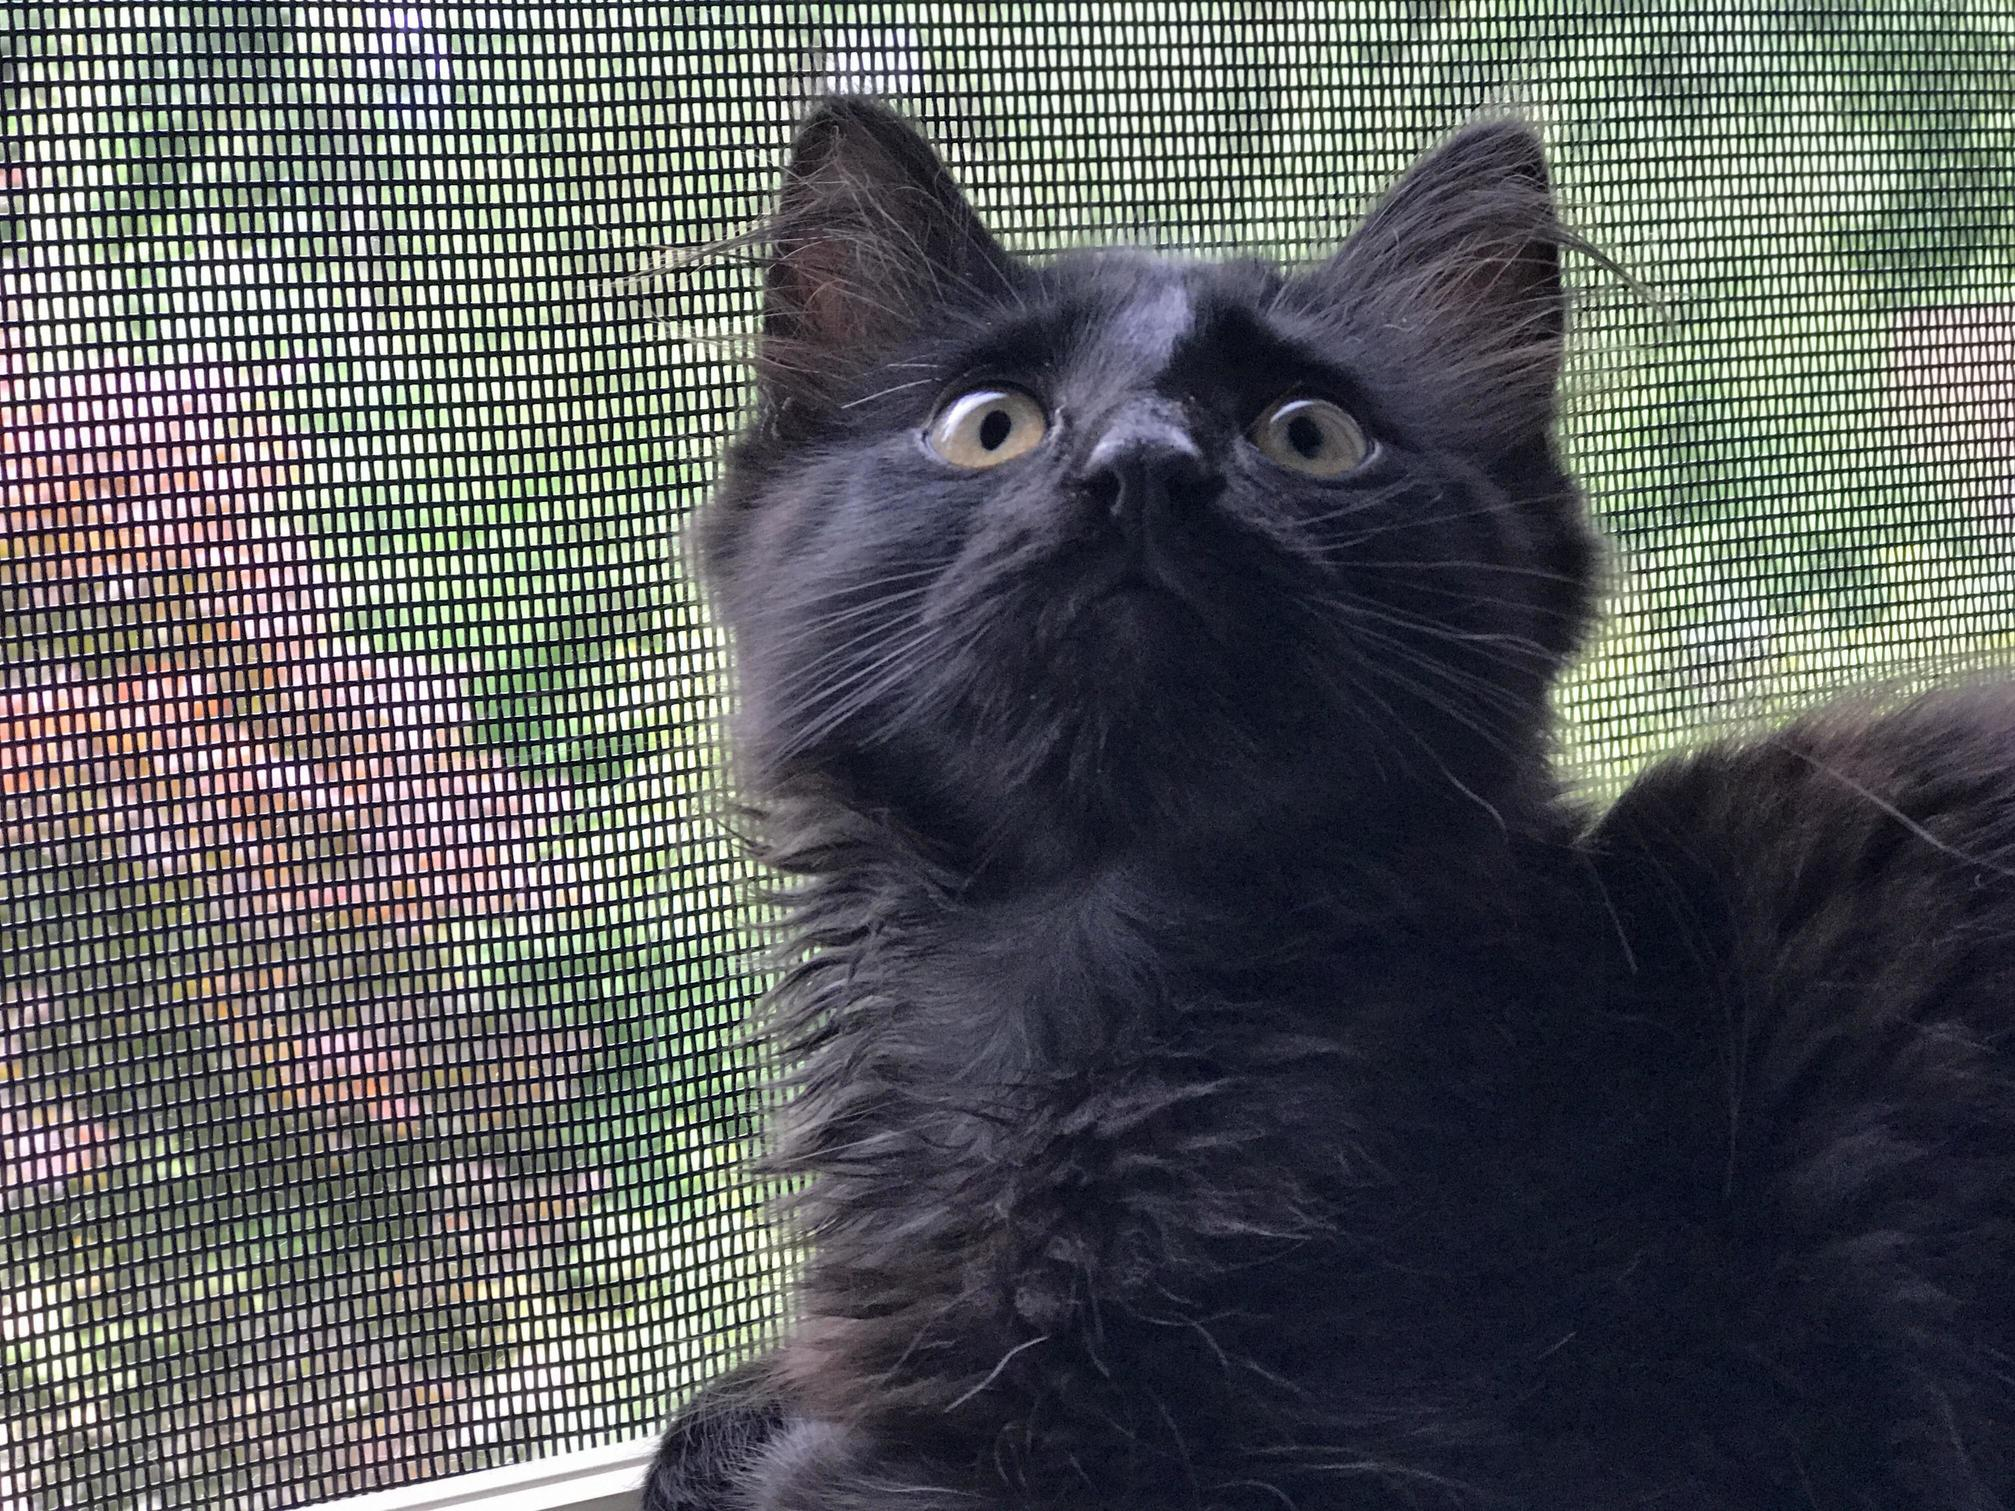 Meet sirius our new rescue kitten